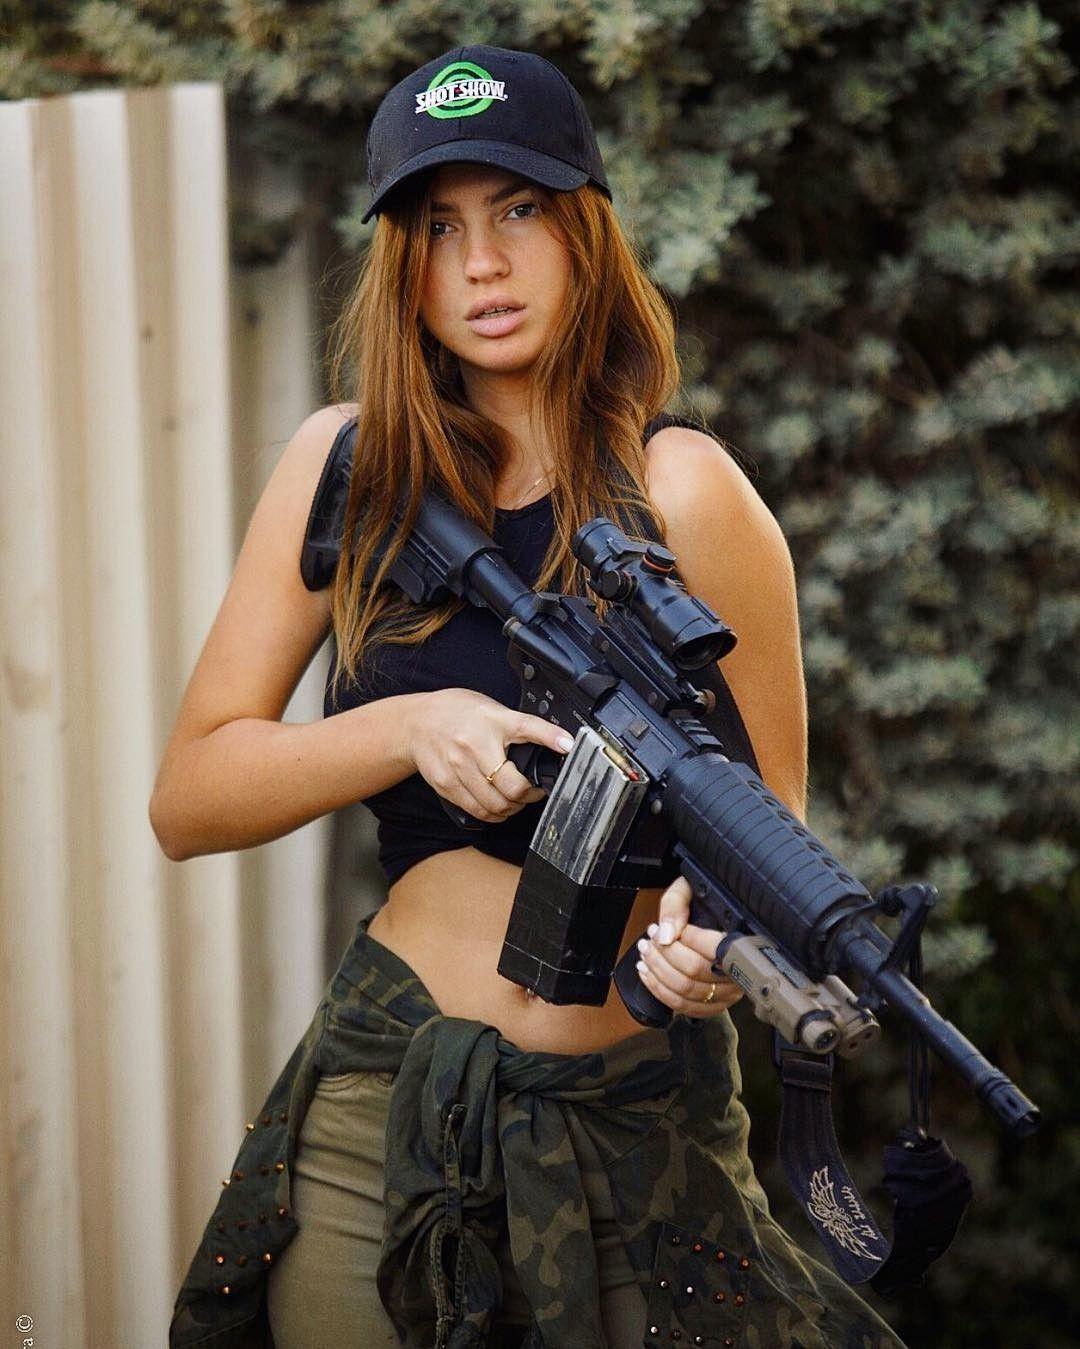 Girl with gun pic